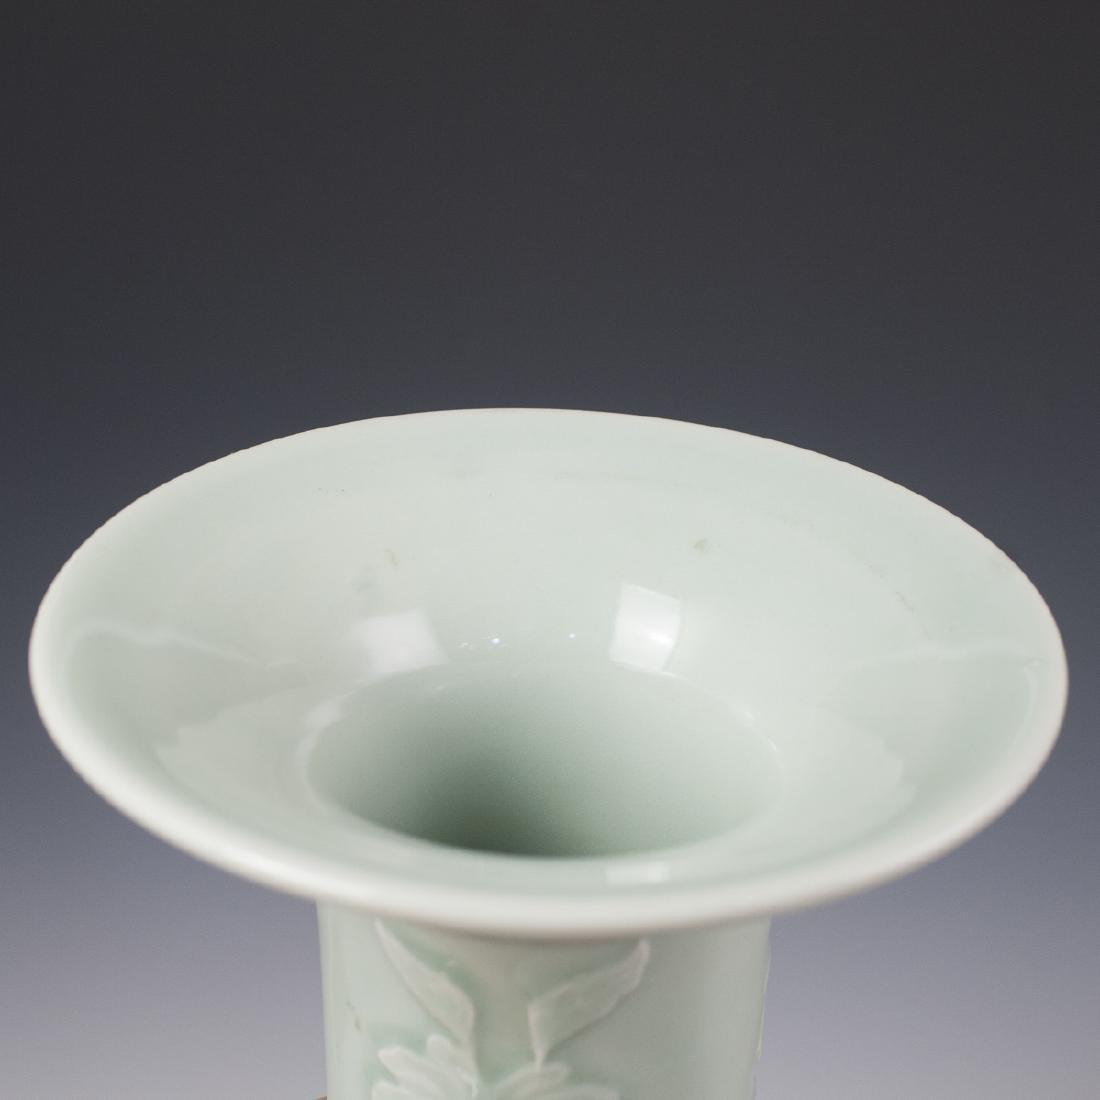 Chinese Celadon Ceramic Fengweizun Vases - 4